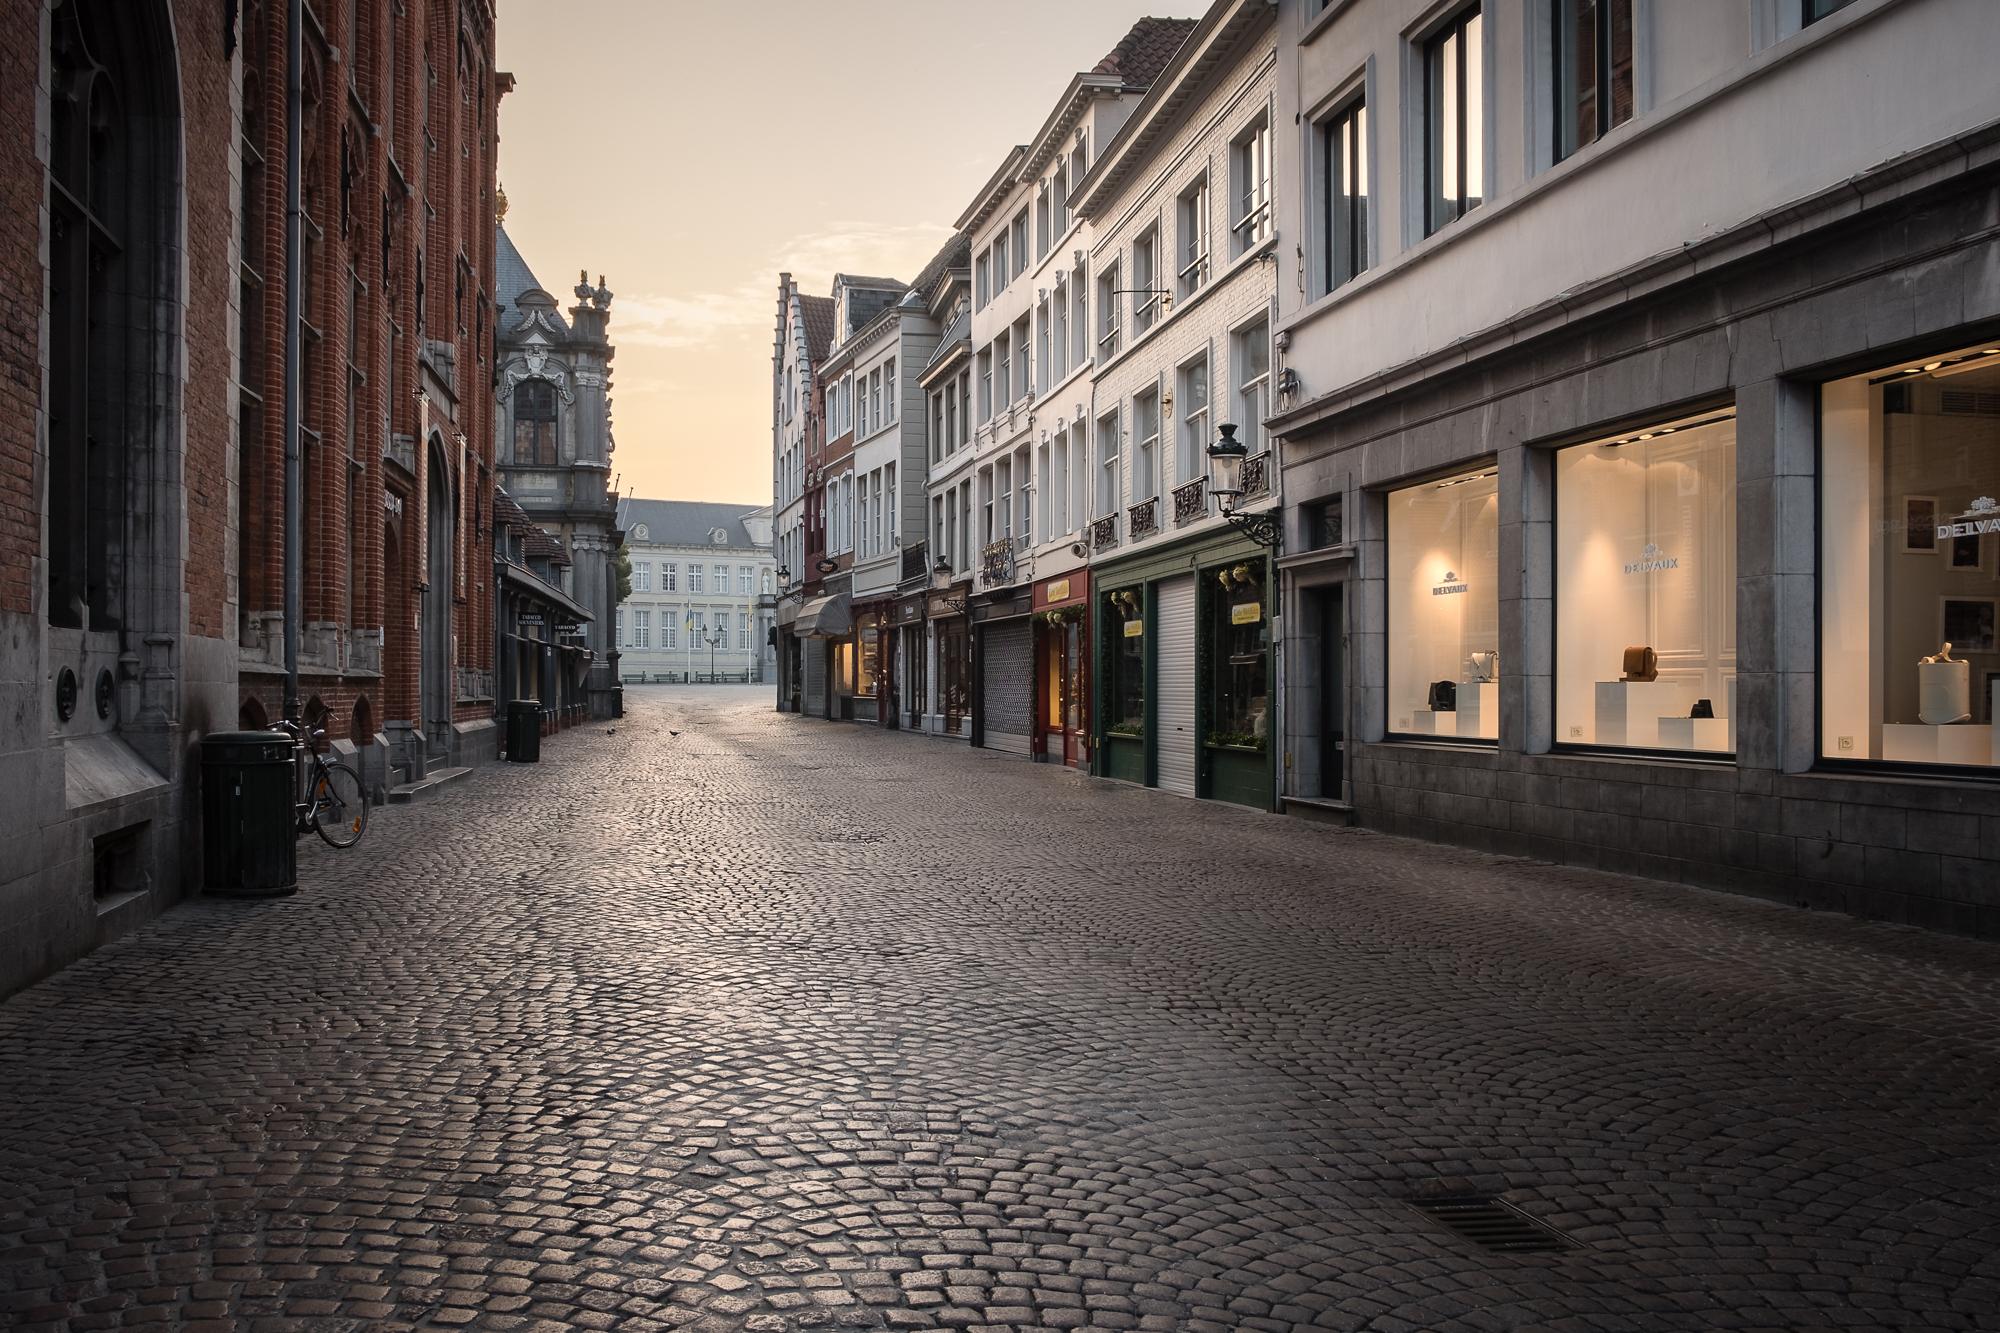 A cobbled street at Burg Square in Bruges, Belgium taken by Trevor Sherwin